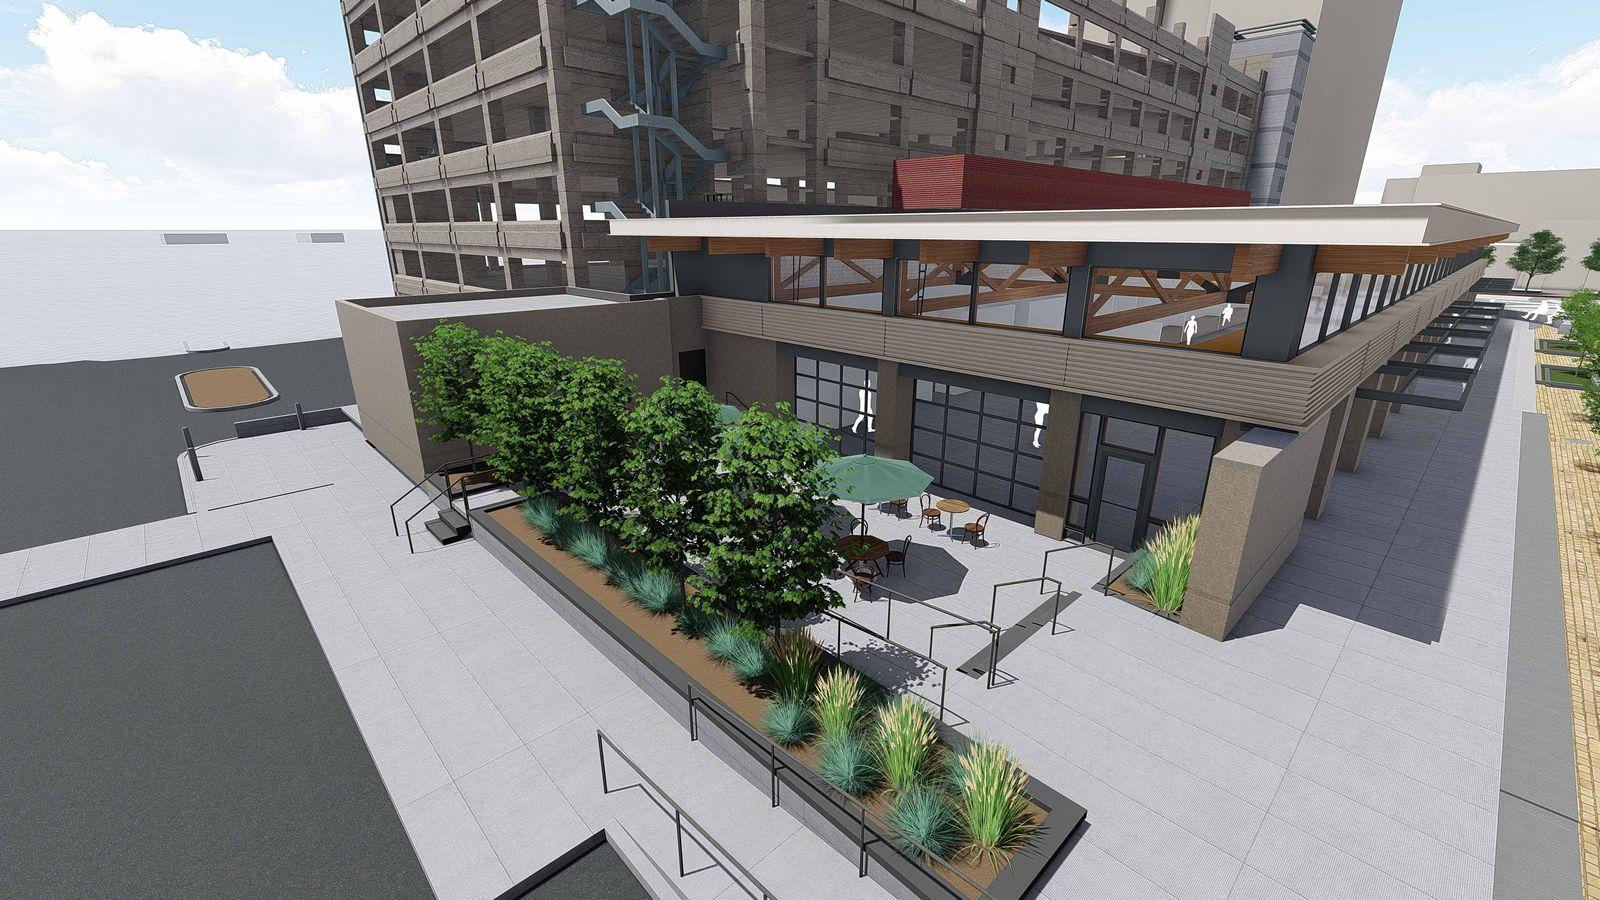 Junction Food & Drink Prepares to Bring Chef-Driven Fare to Colorado Center